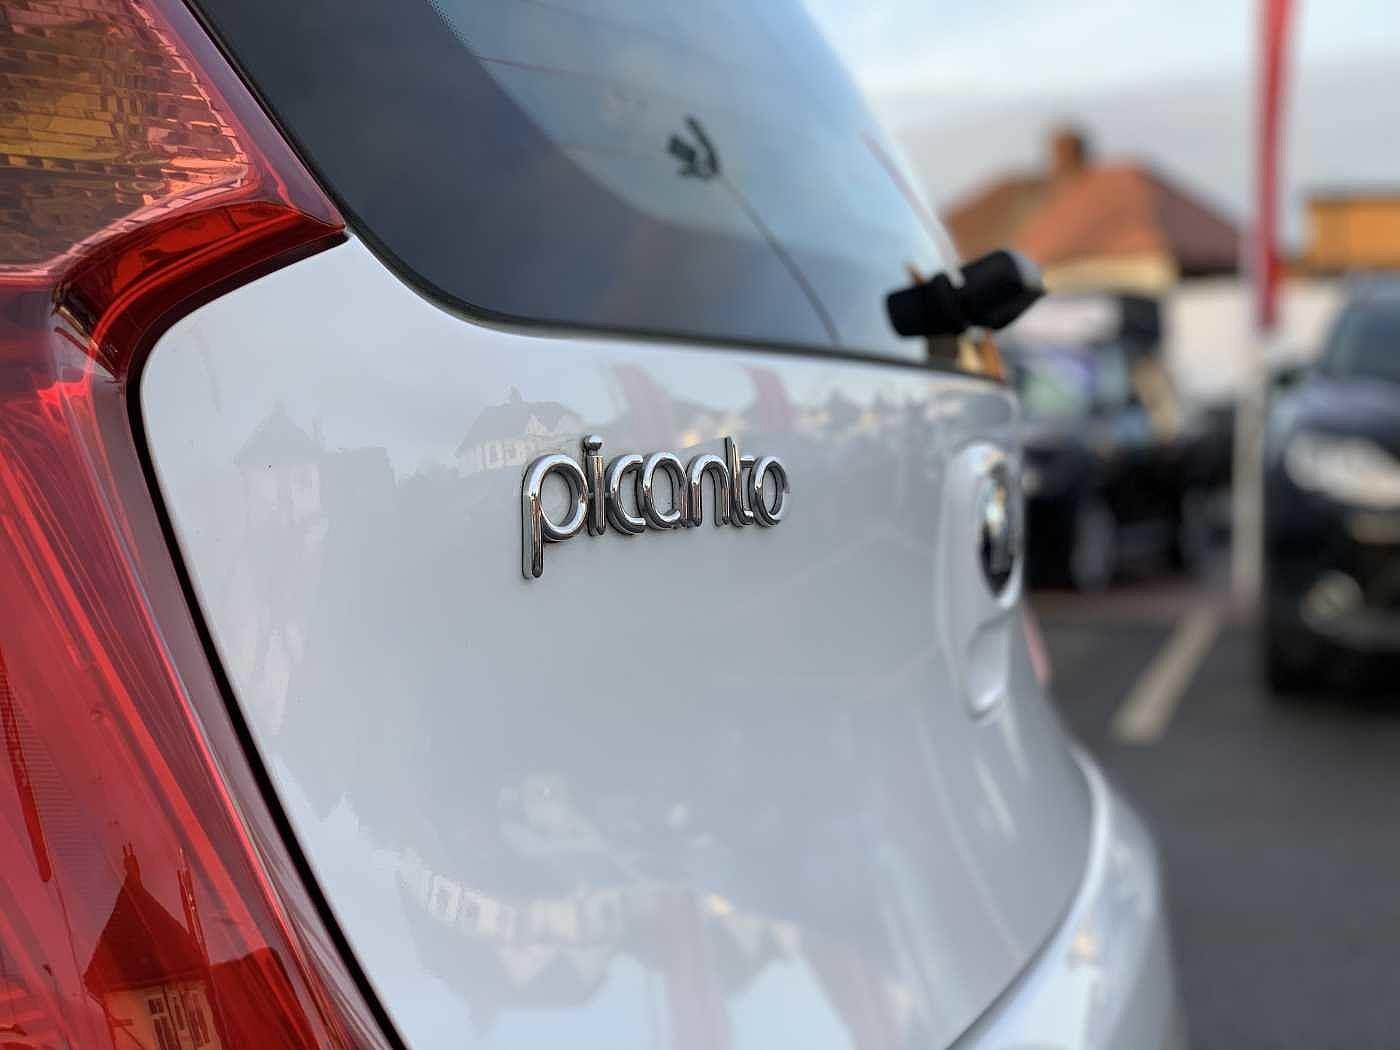 Kia Picanto 1.0 [65] 1 5dr Hatchback